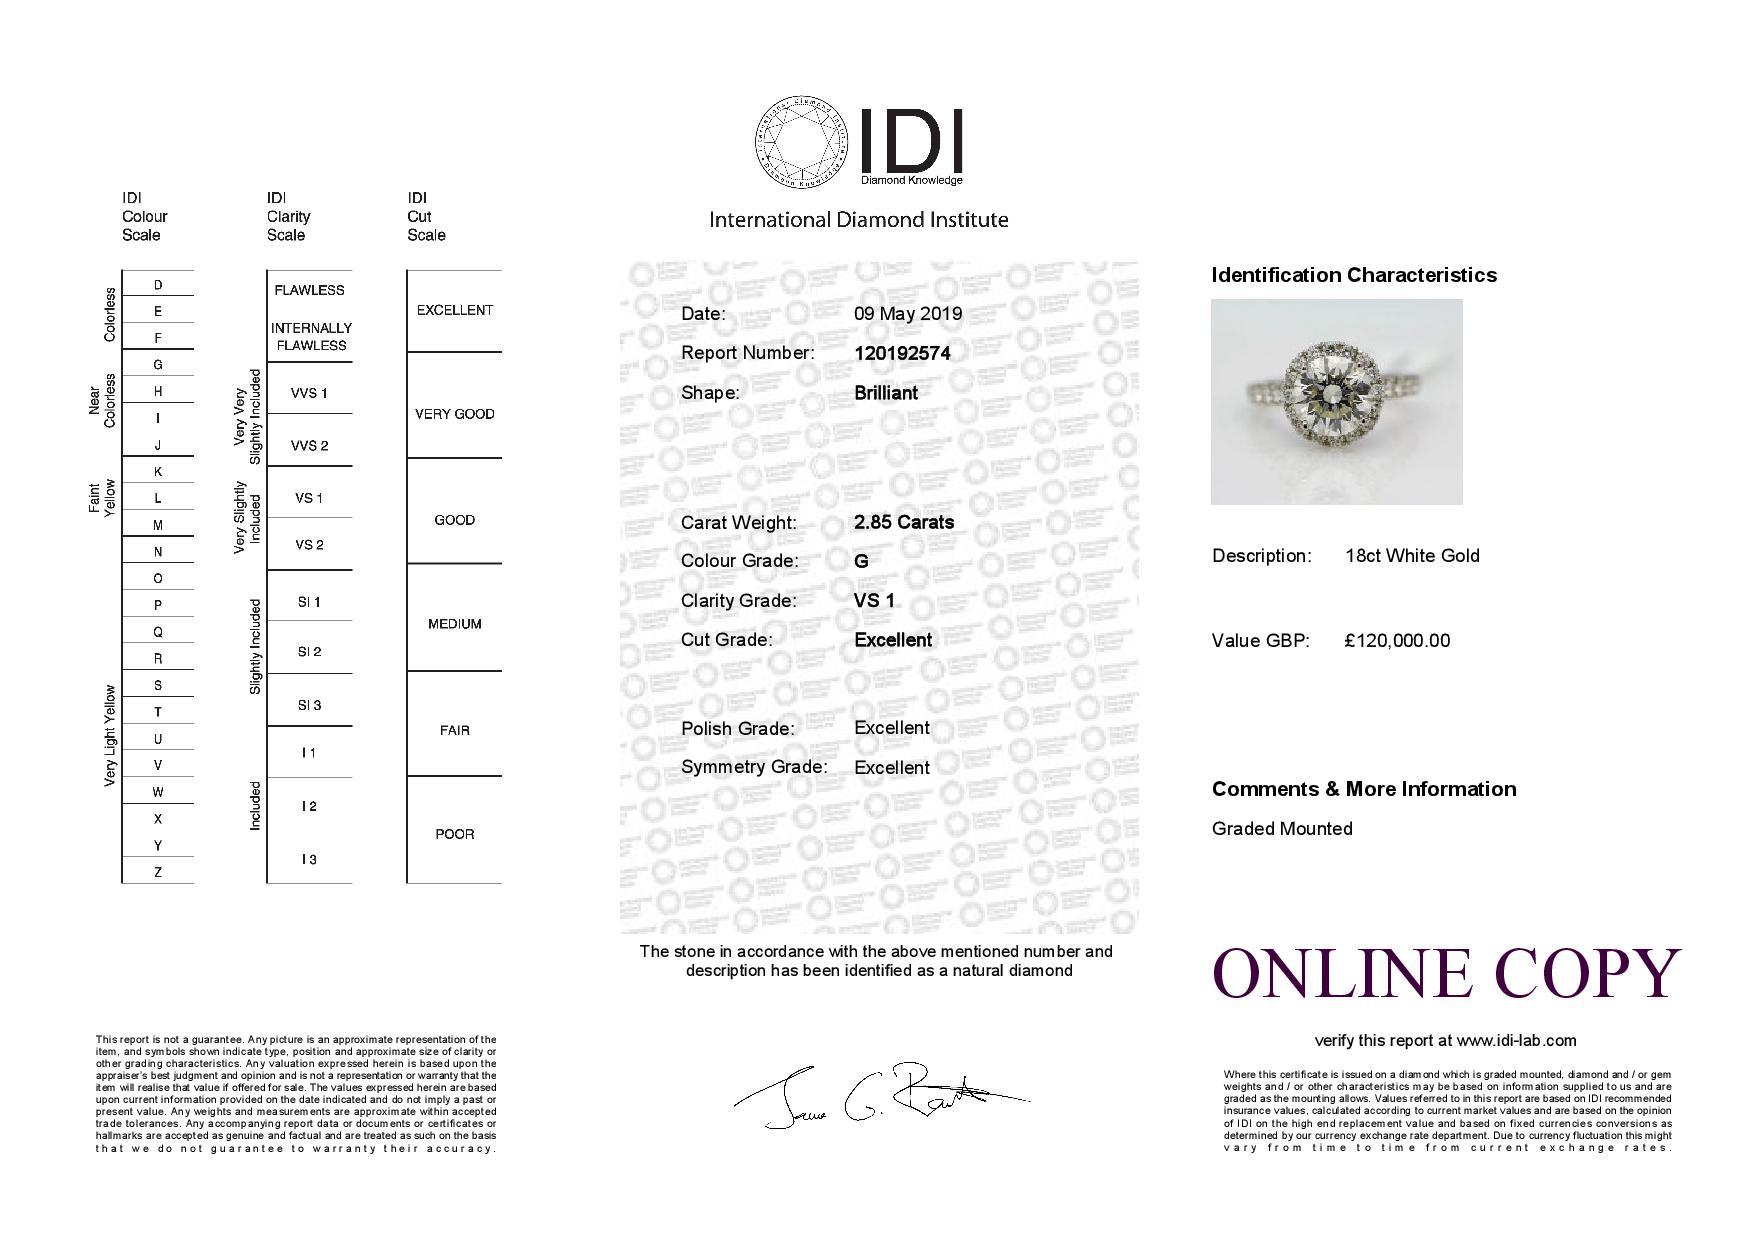 18k White Gold Single Stone With Halo Setting Ring 3.85 - Image 3 of 3